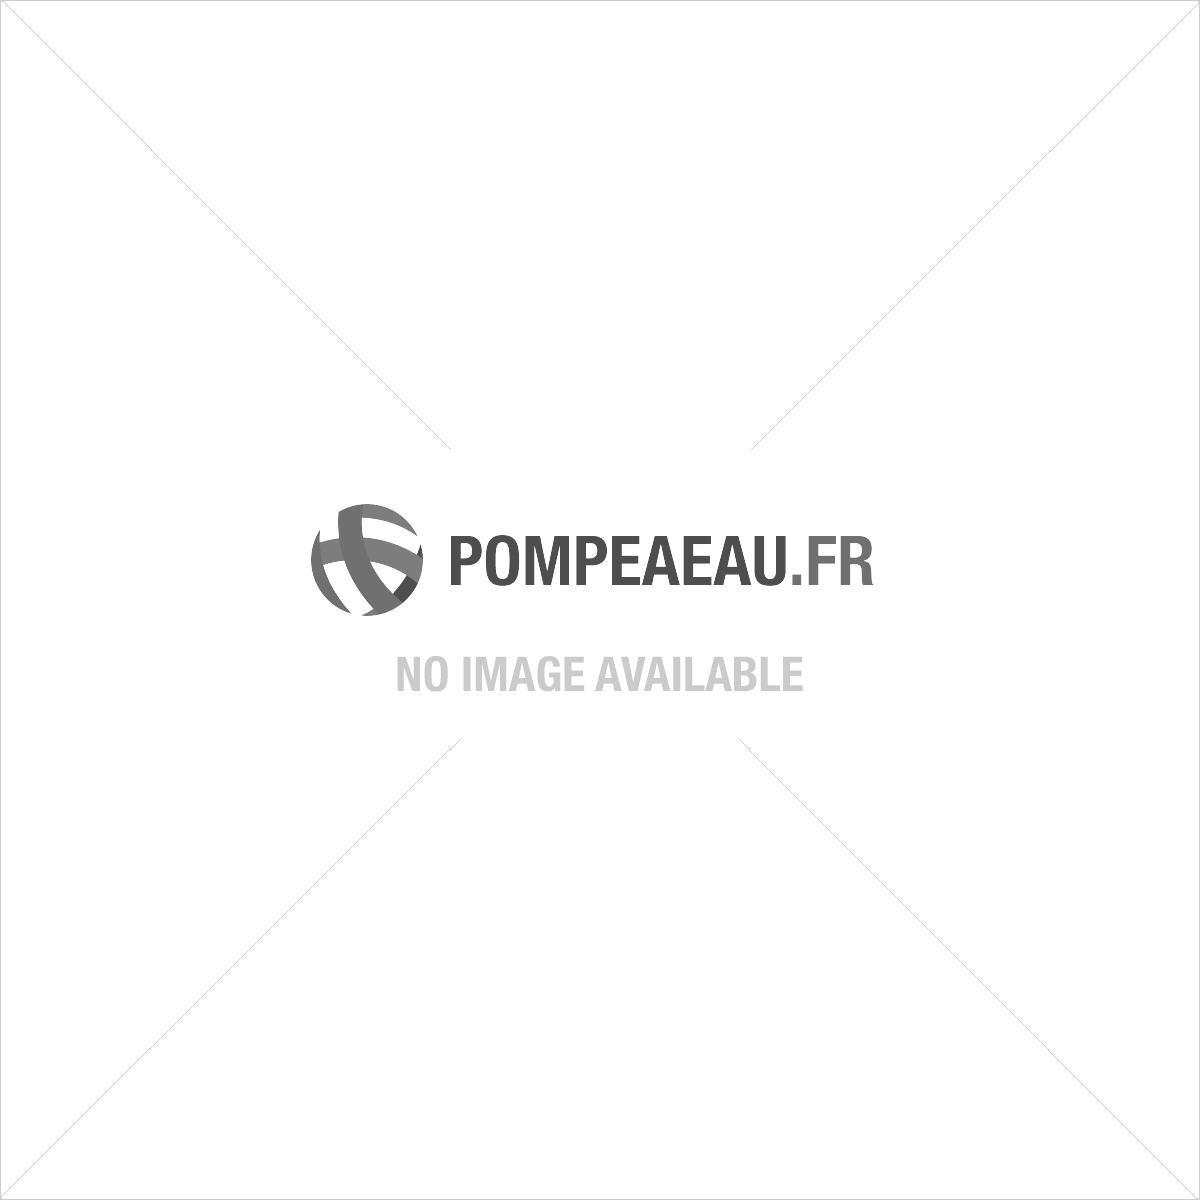 AquaForte DM-30000 Vario Pompe de bassin